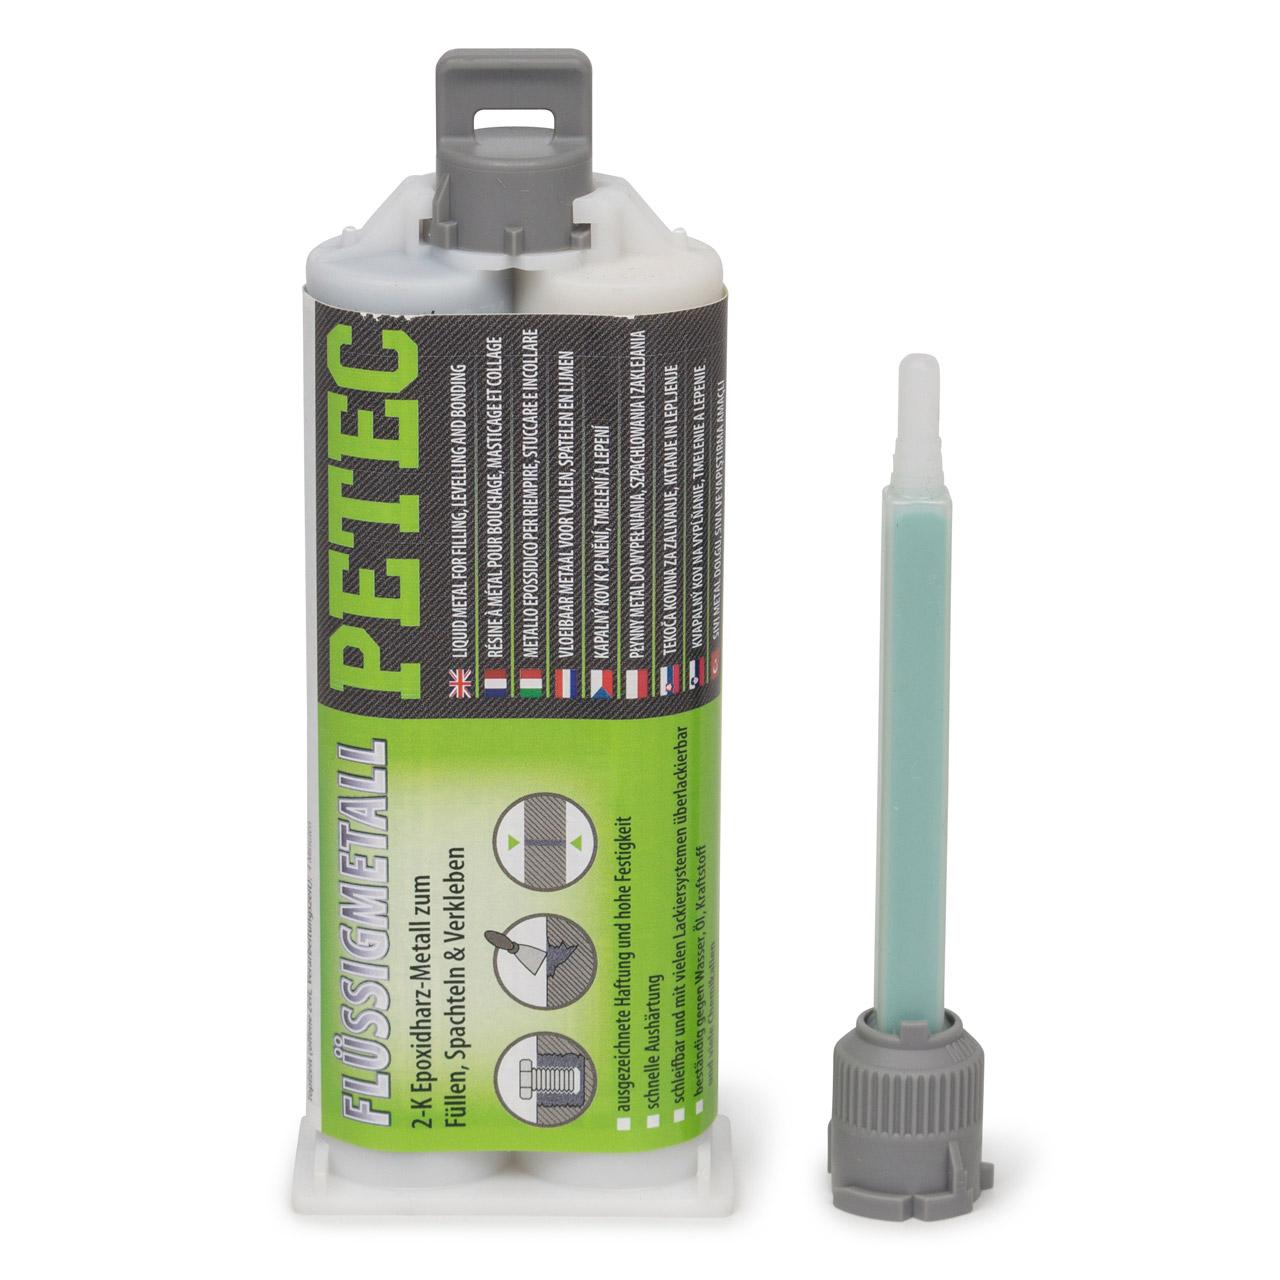 PETEC 97355 Flüssigmetall 2-komponentenkleber Epoxidharz-Metall 50ml